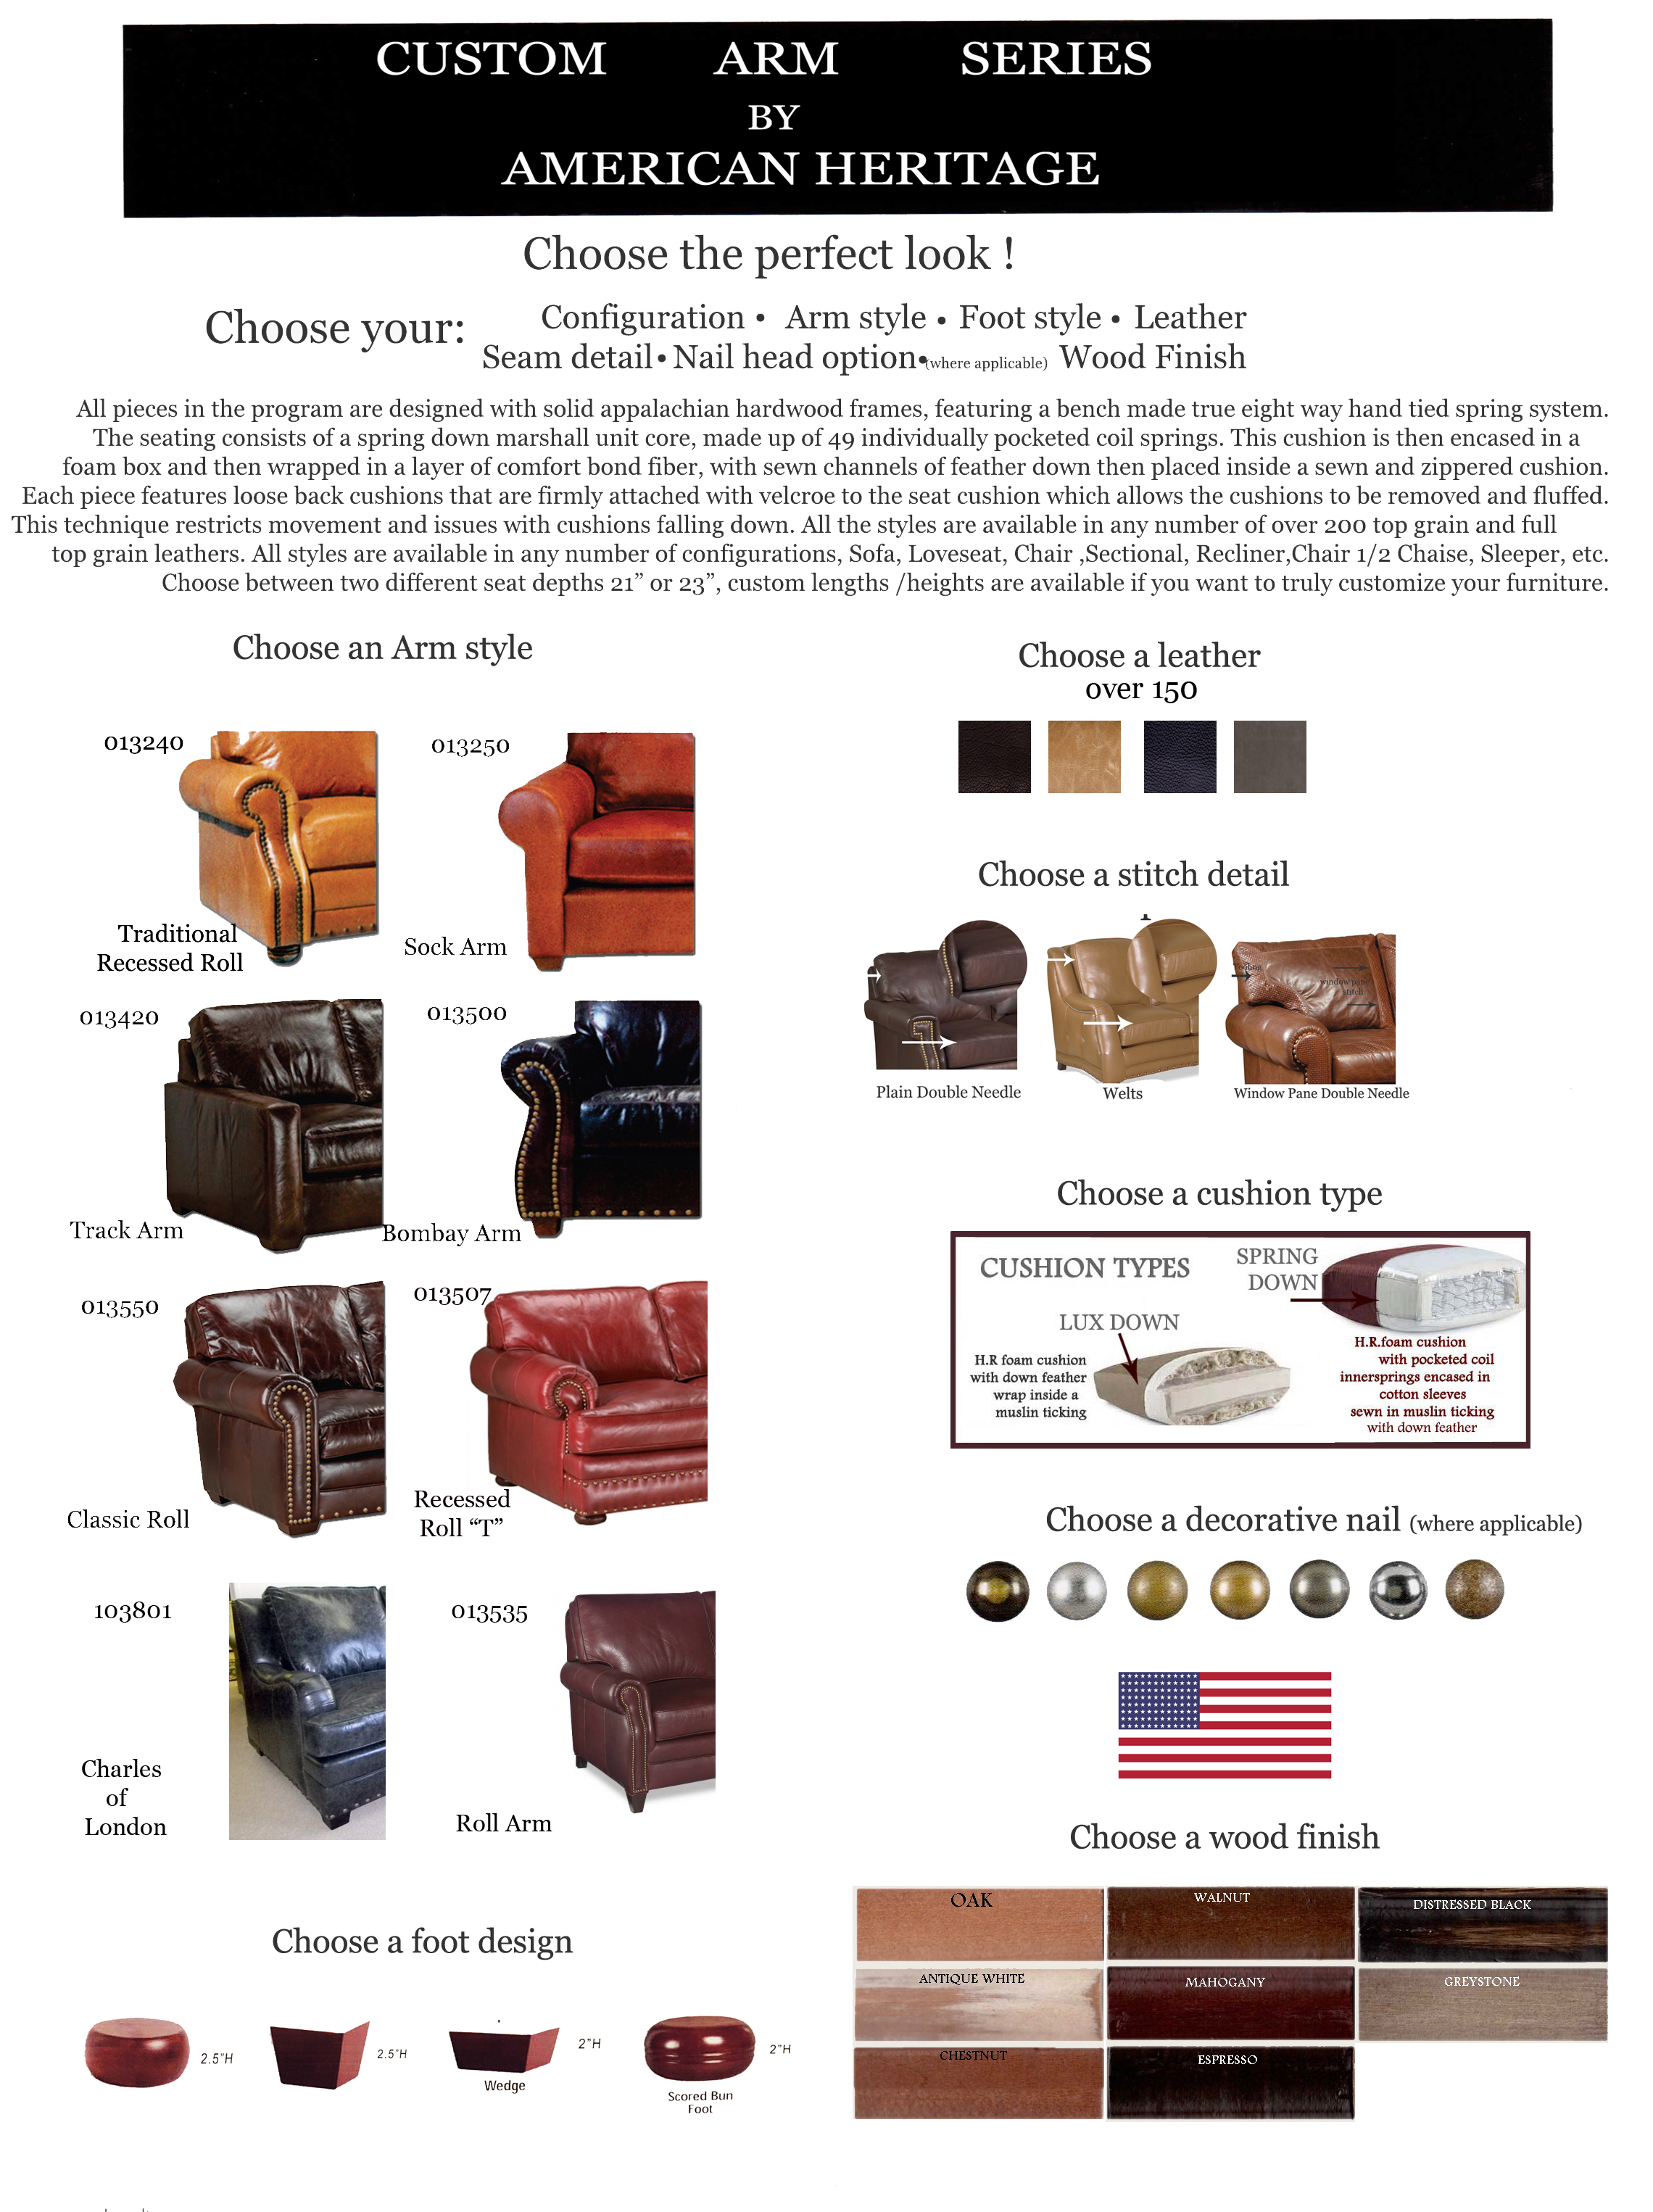 American Heritage custom arm series